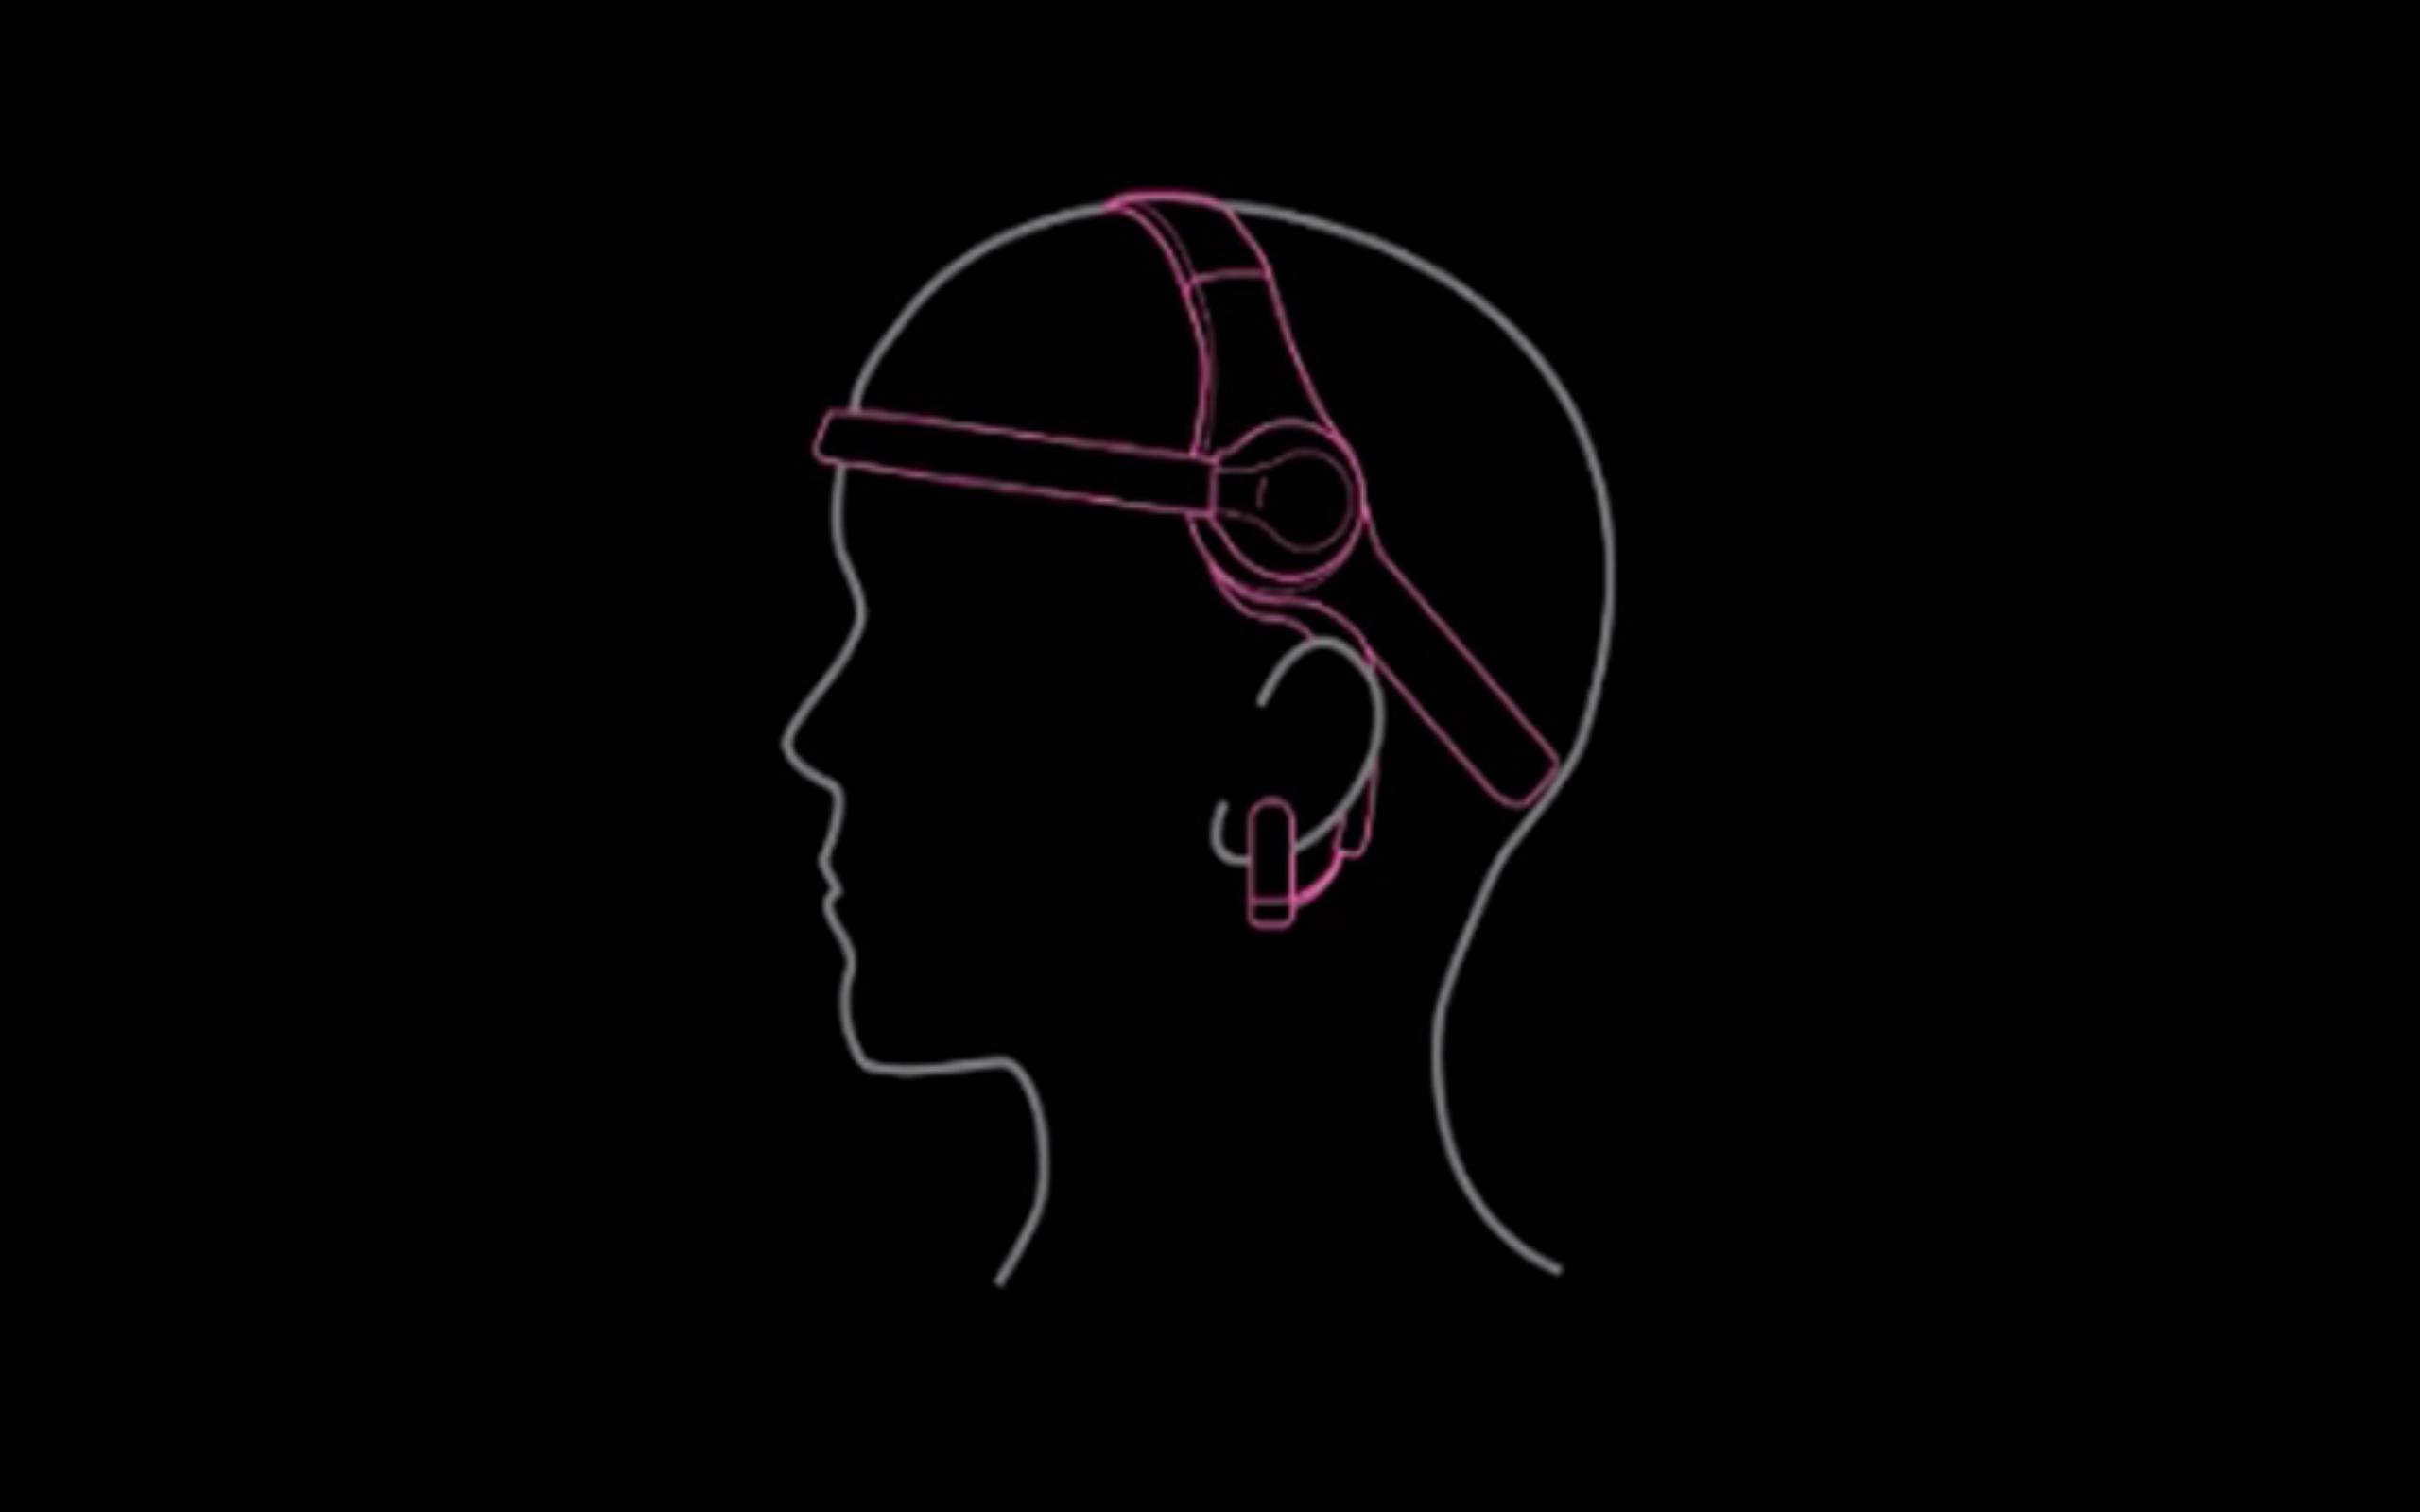 Mind Control TV - BBC